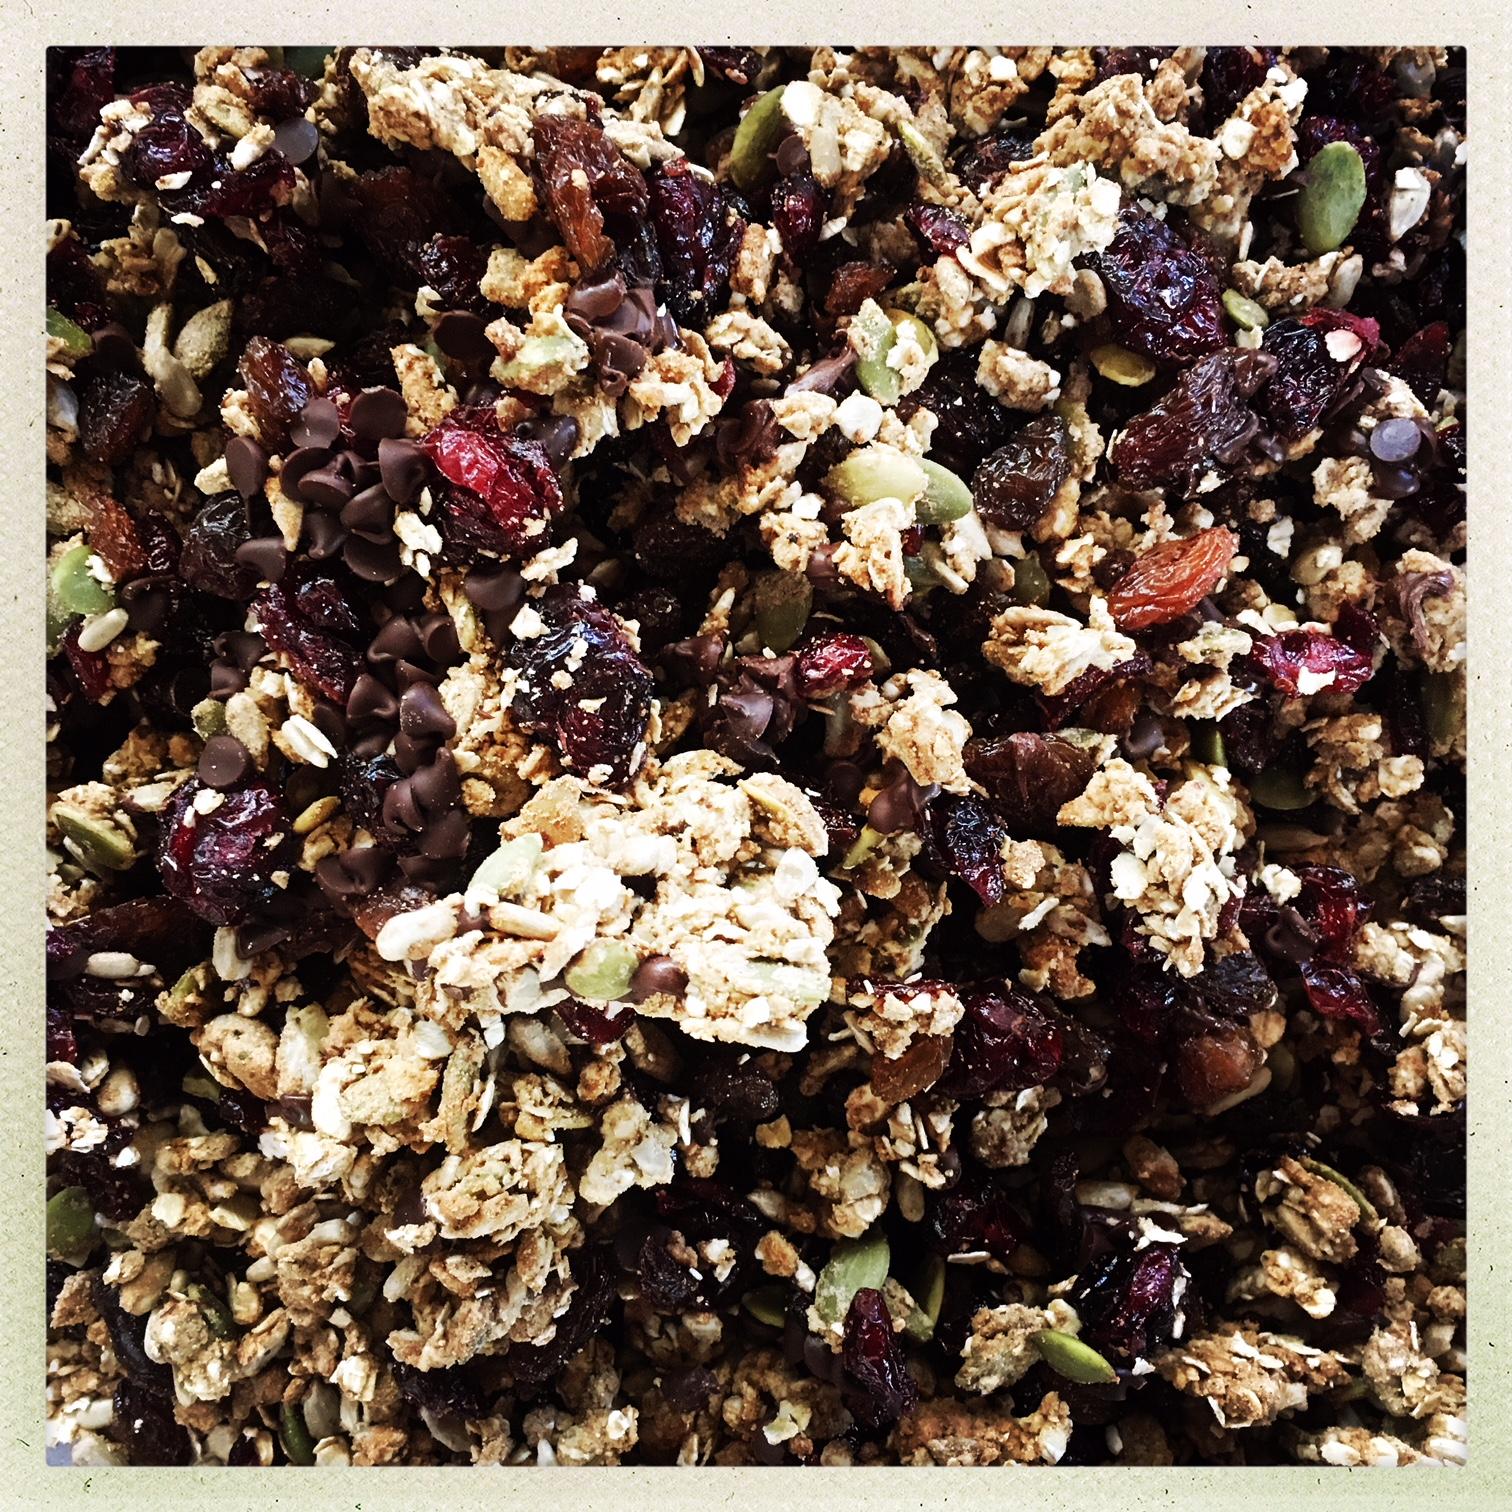 OriginalPchocolate seed protein granola 2hoto-544296445.971780.jpg